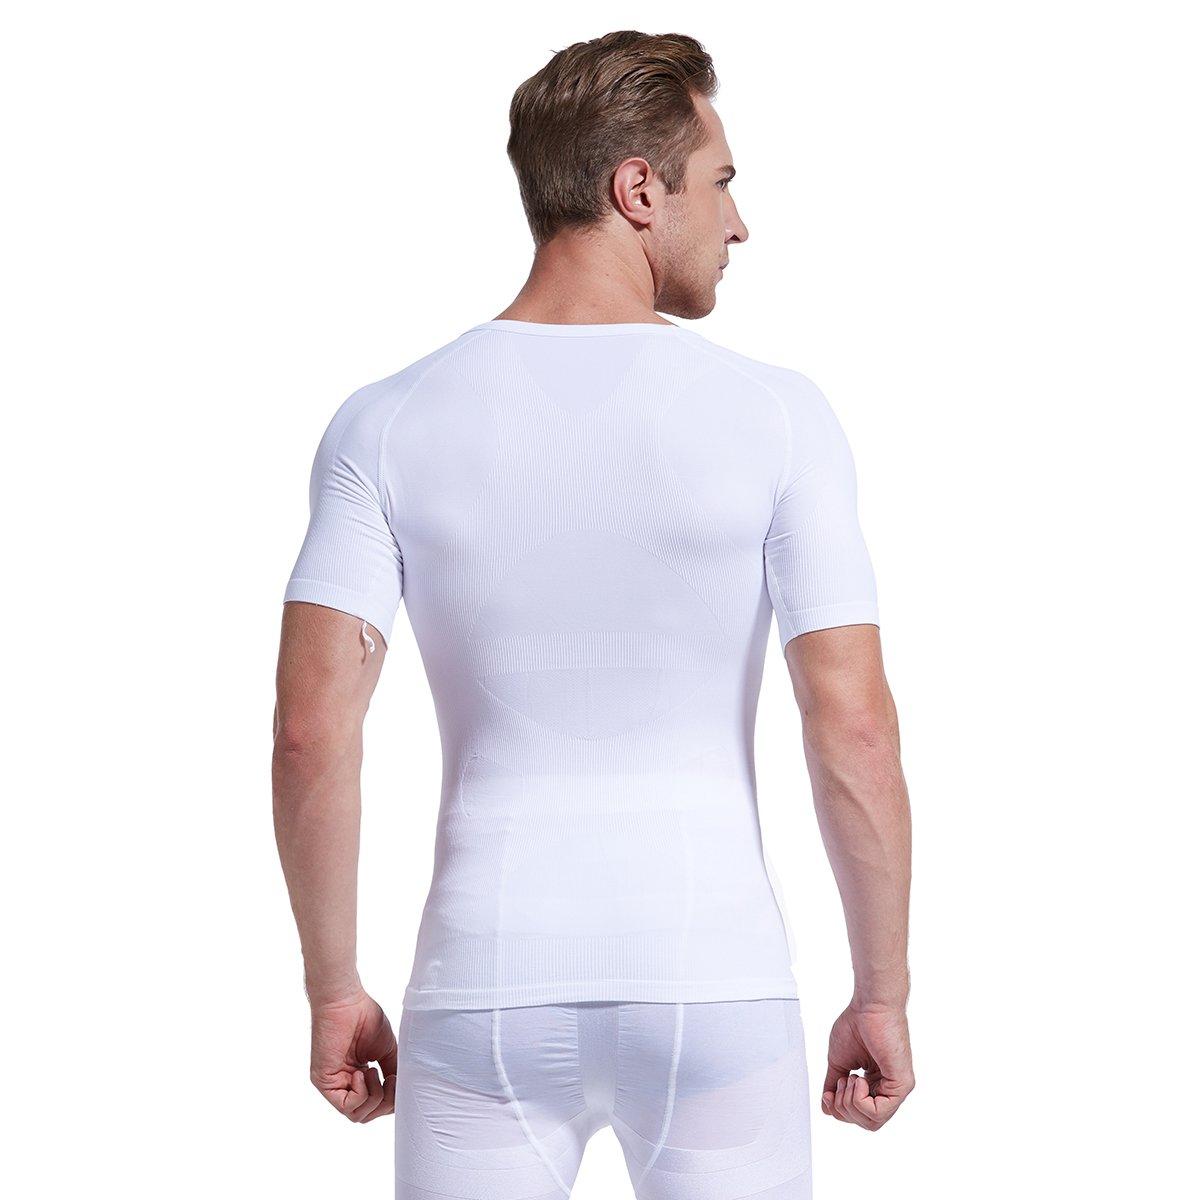 Hoter Mens Slim and Tight Super Soft Compression & Slimming Shaper V-Neck T-Shirt by HÖTER (Image #6)